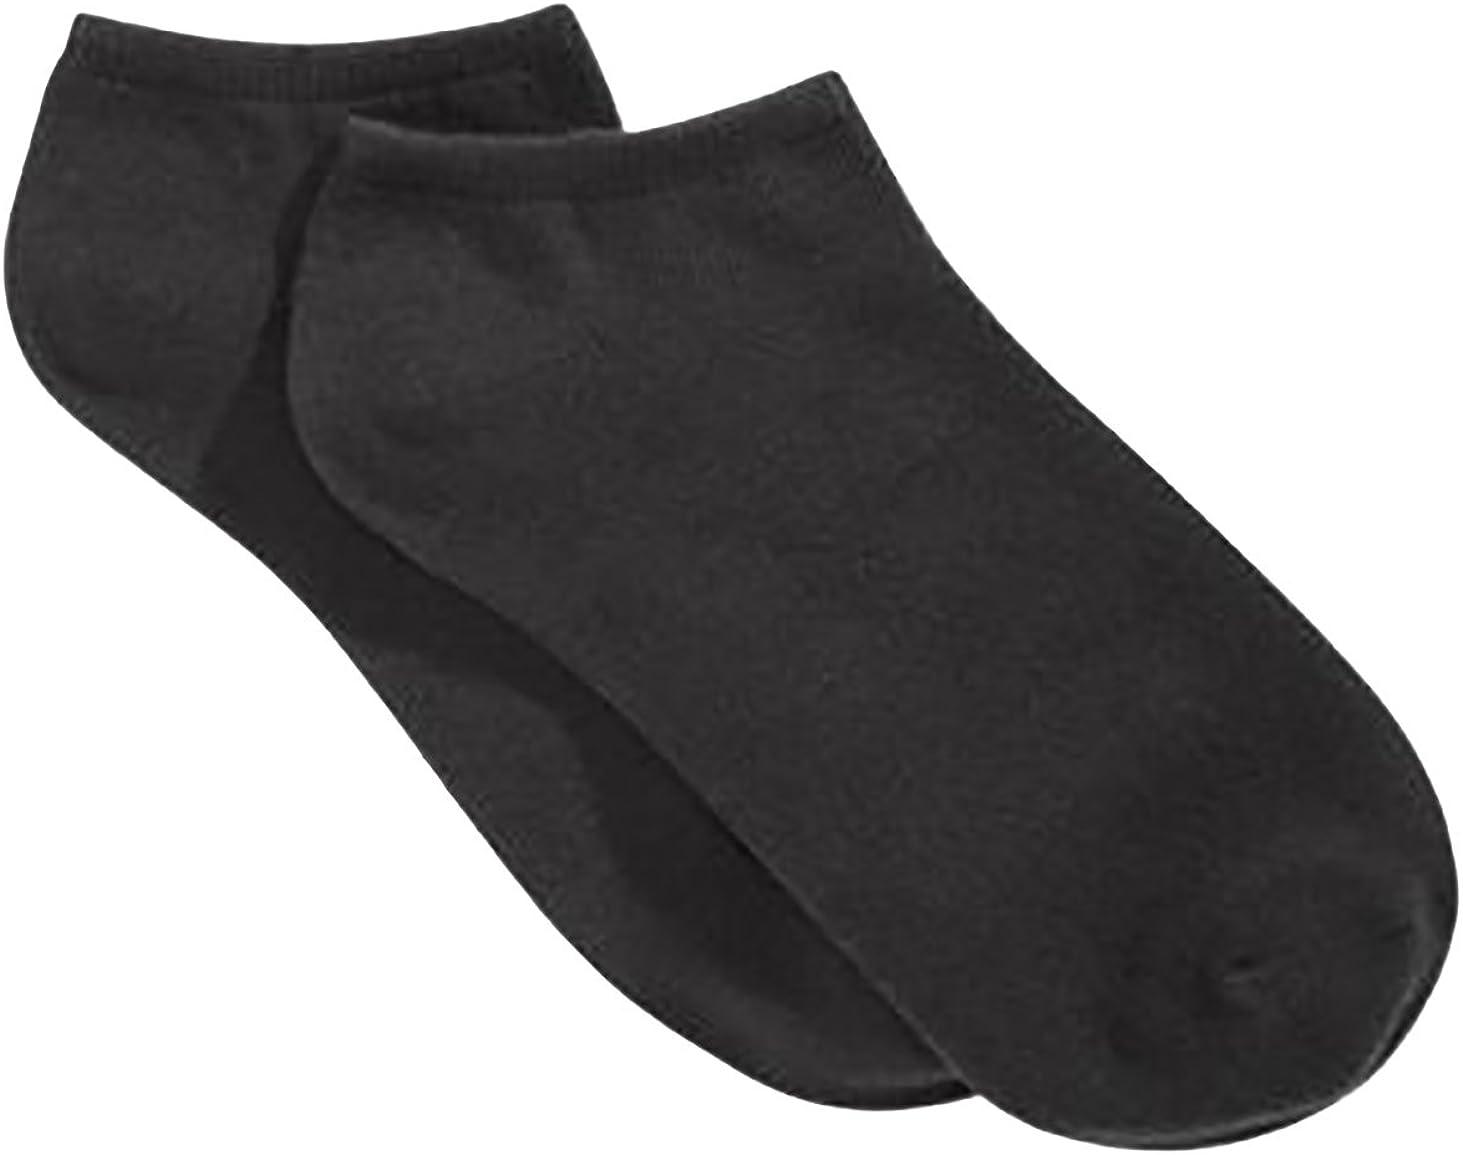 Alfani Spectrum Solid Lowcut Socks One Size One Pair Black